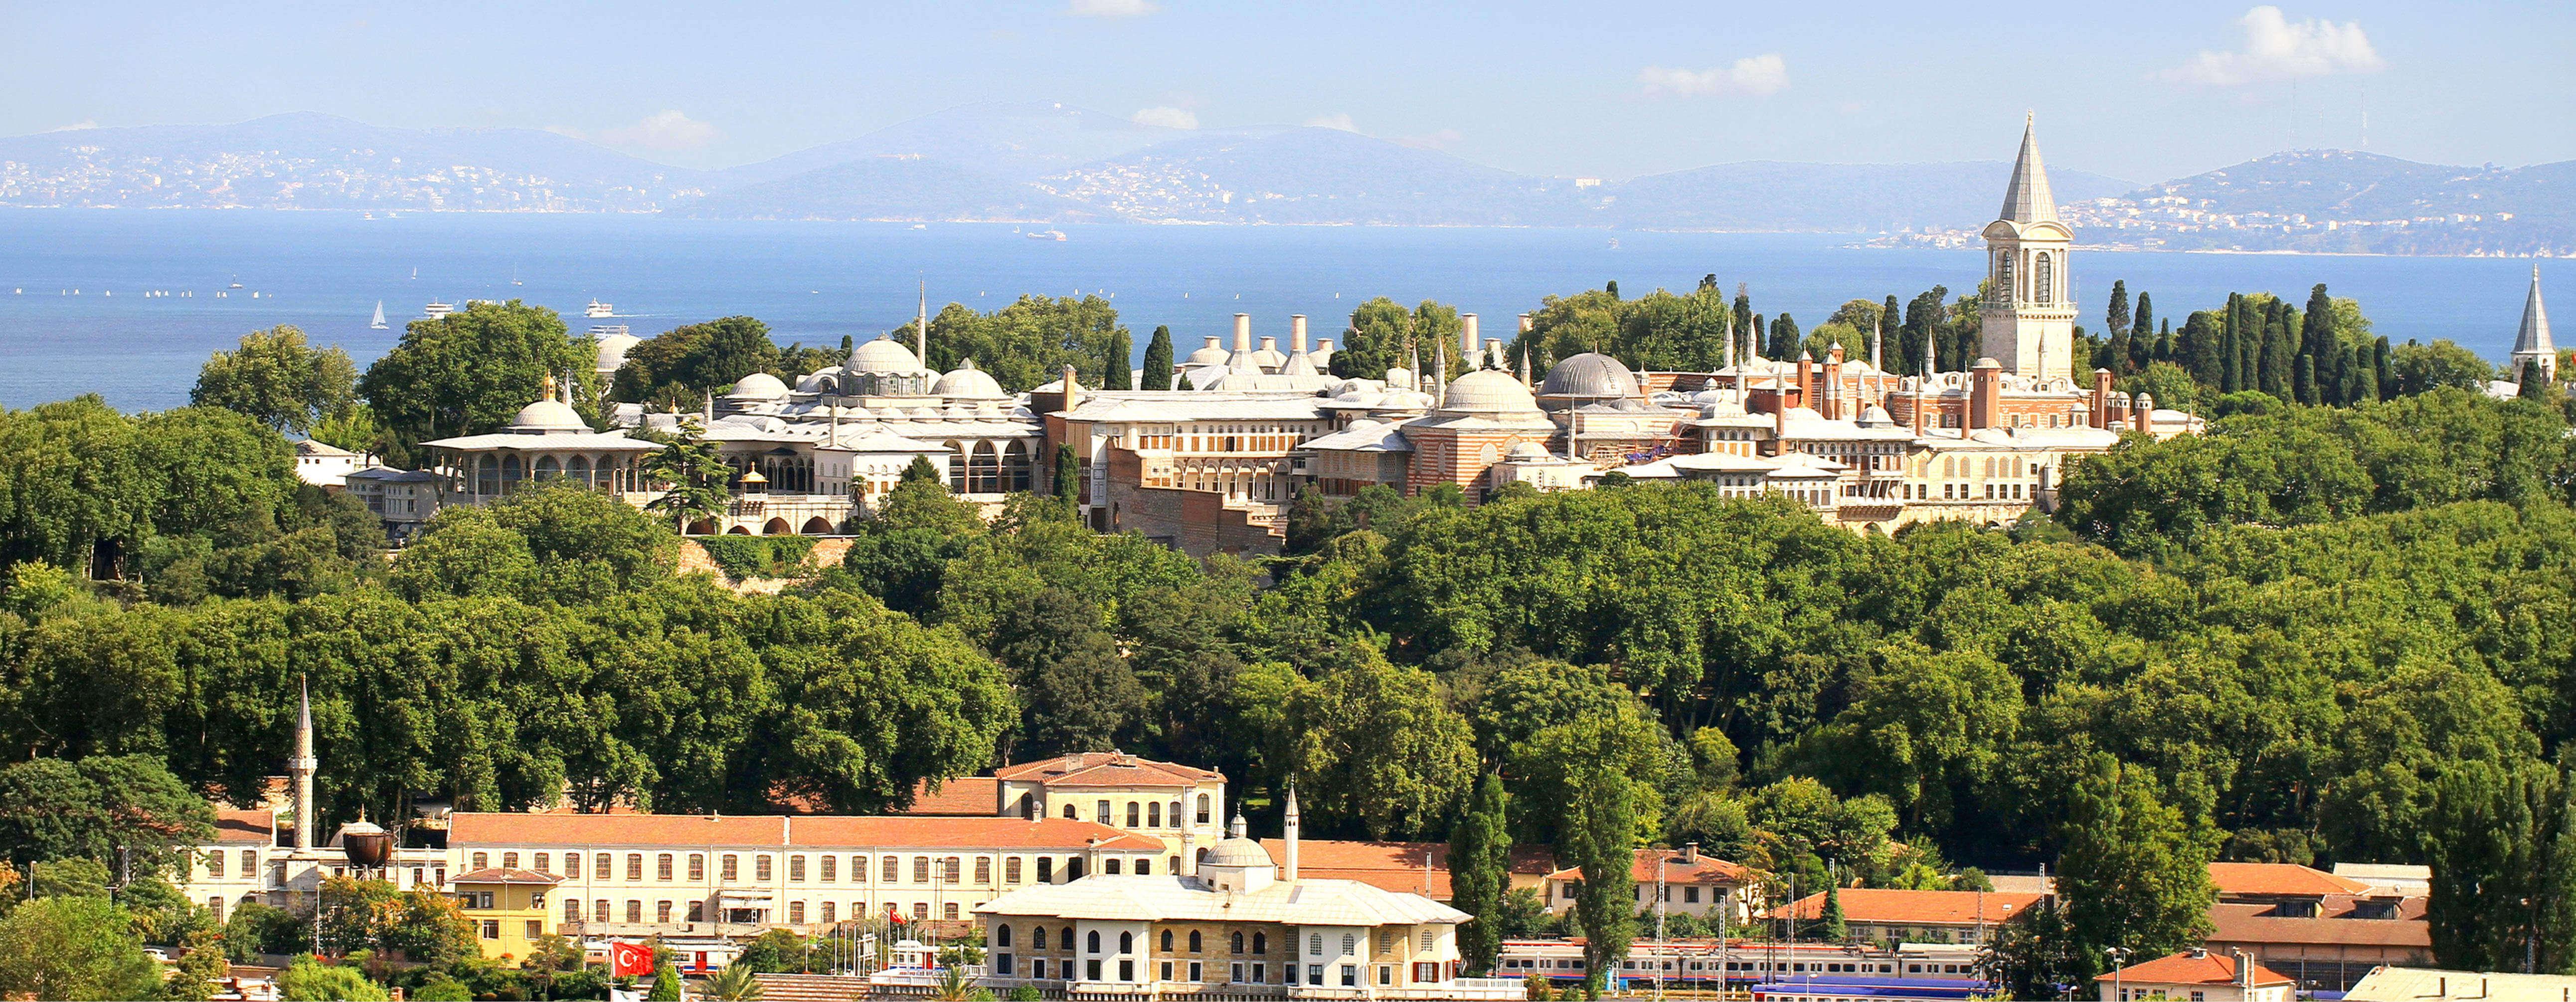 5 Star Luxury Hotel & Resort in Istanbul - Raffles Istanbul